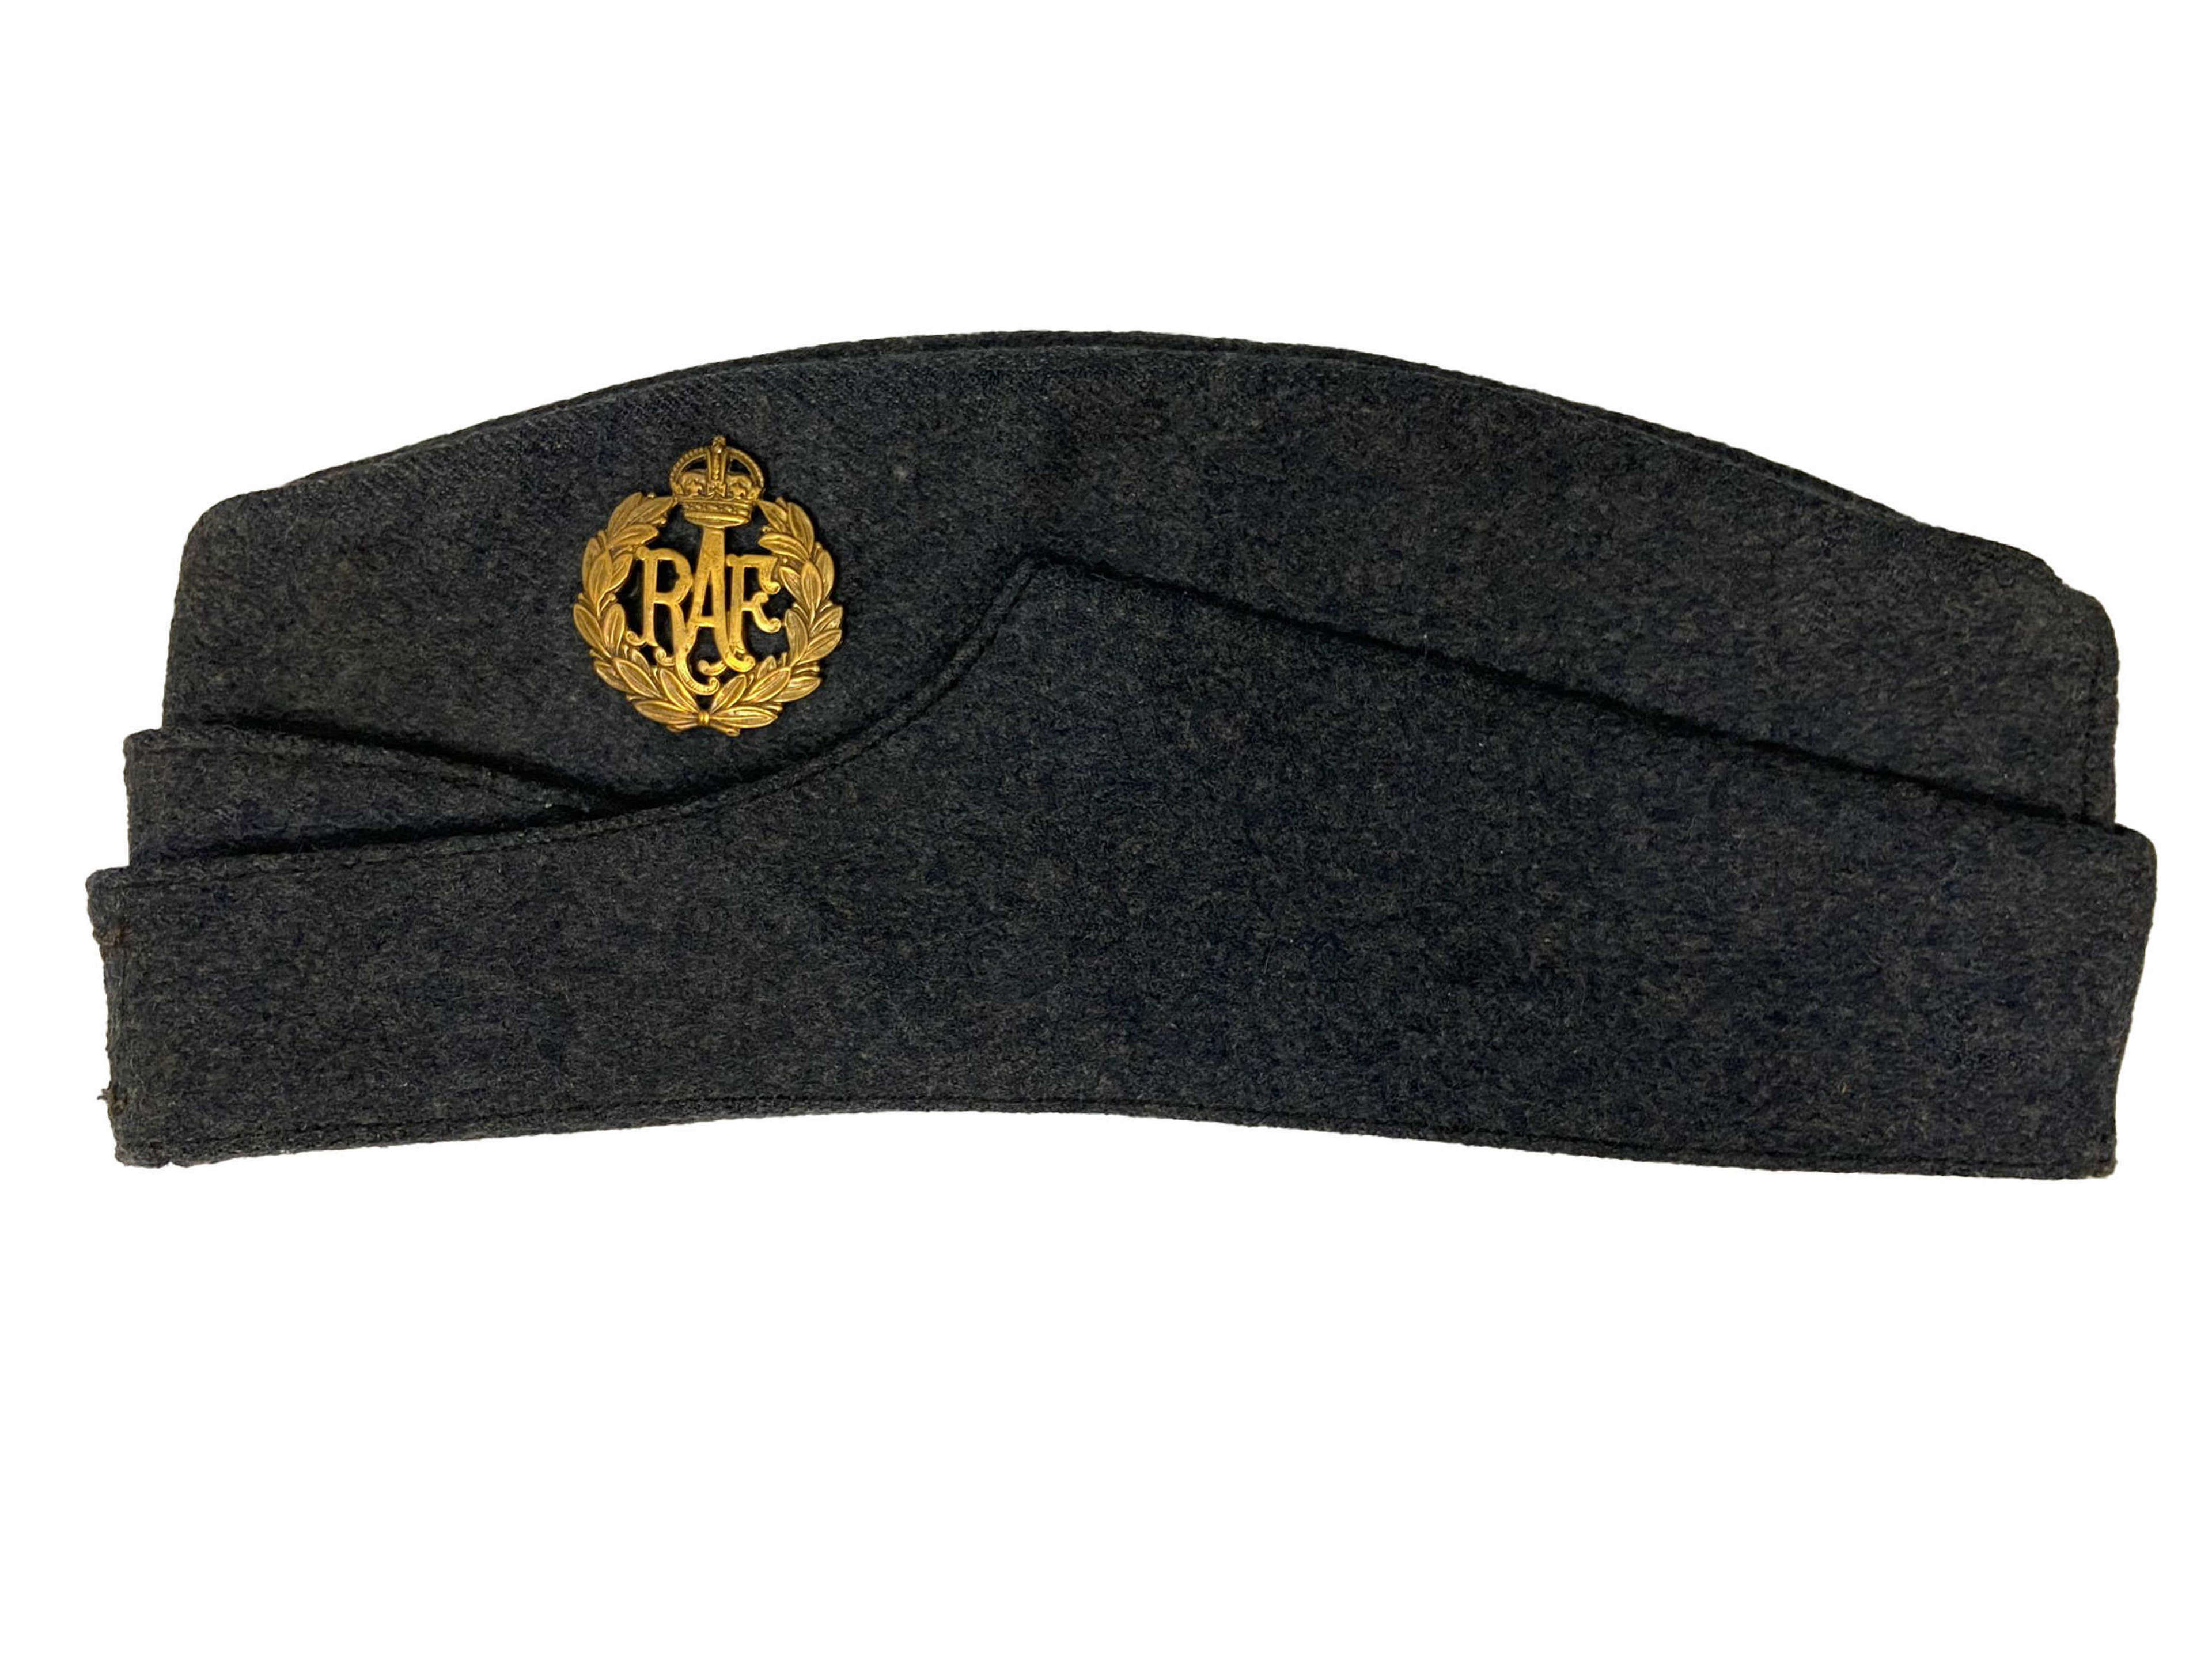 Original 1943 Dated RAF Ordinary Airman's Forage Cap